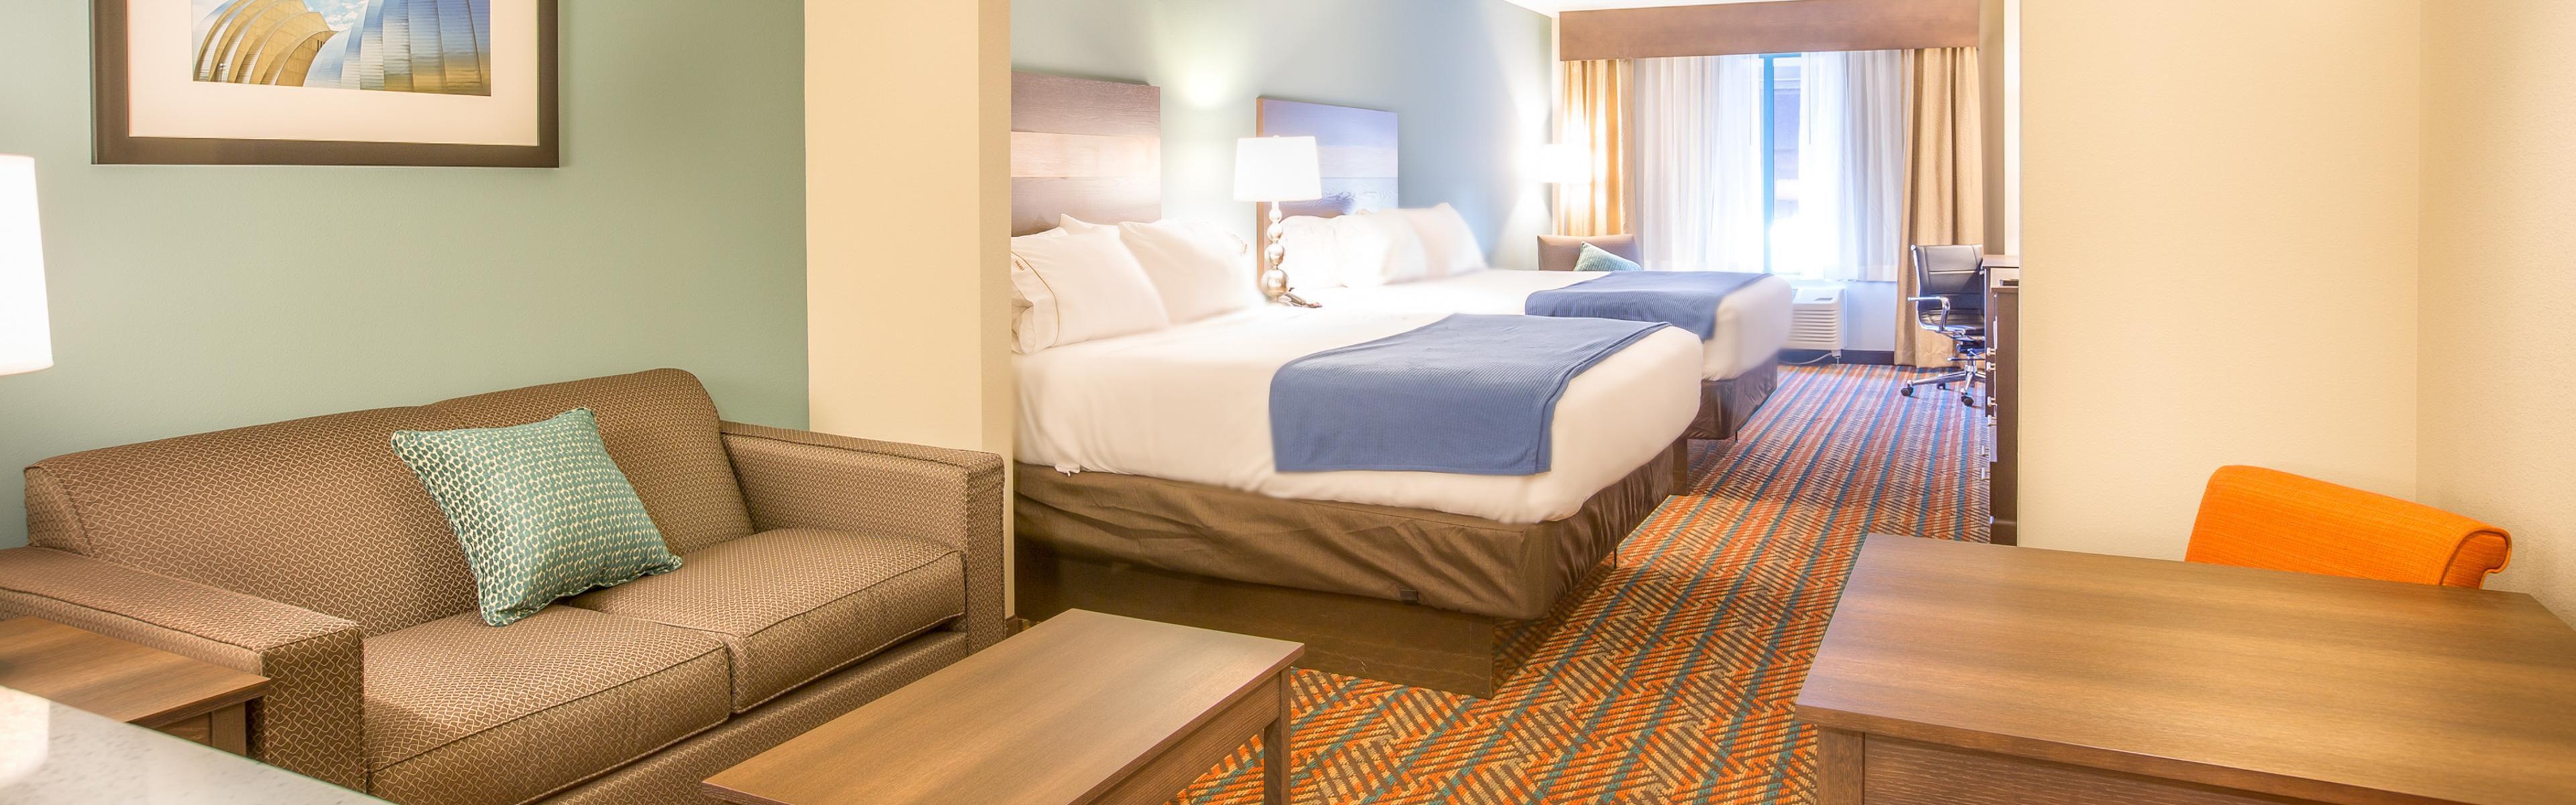 Holiday Inn Express Wichita South image 1